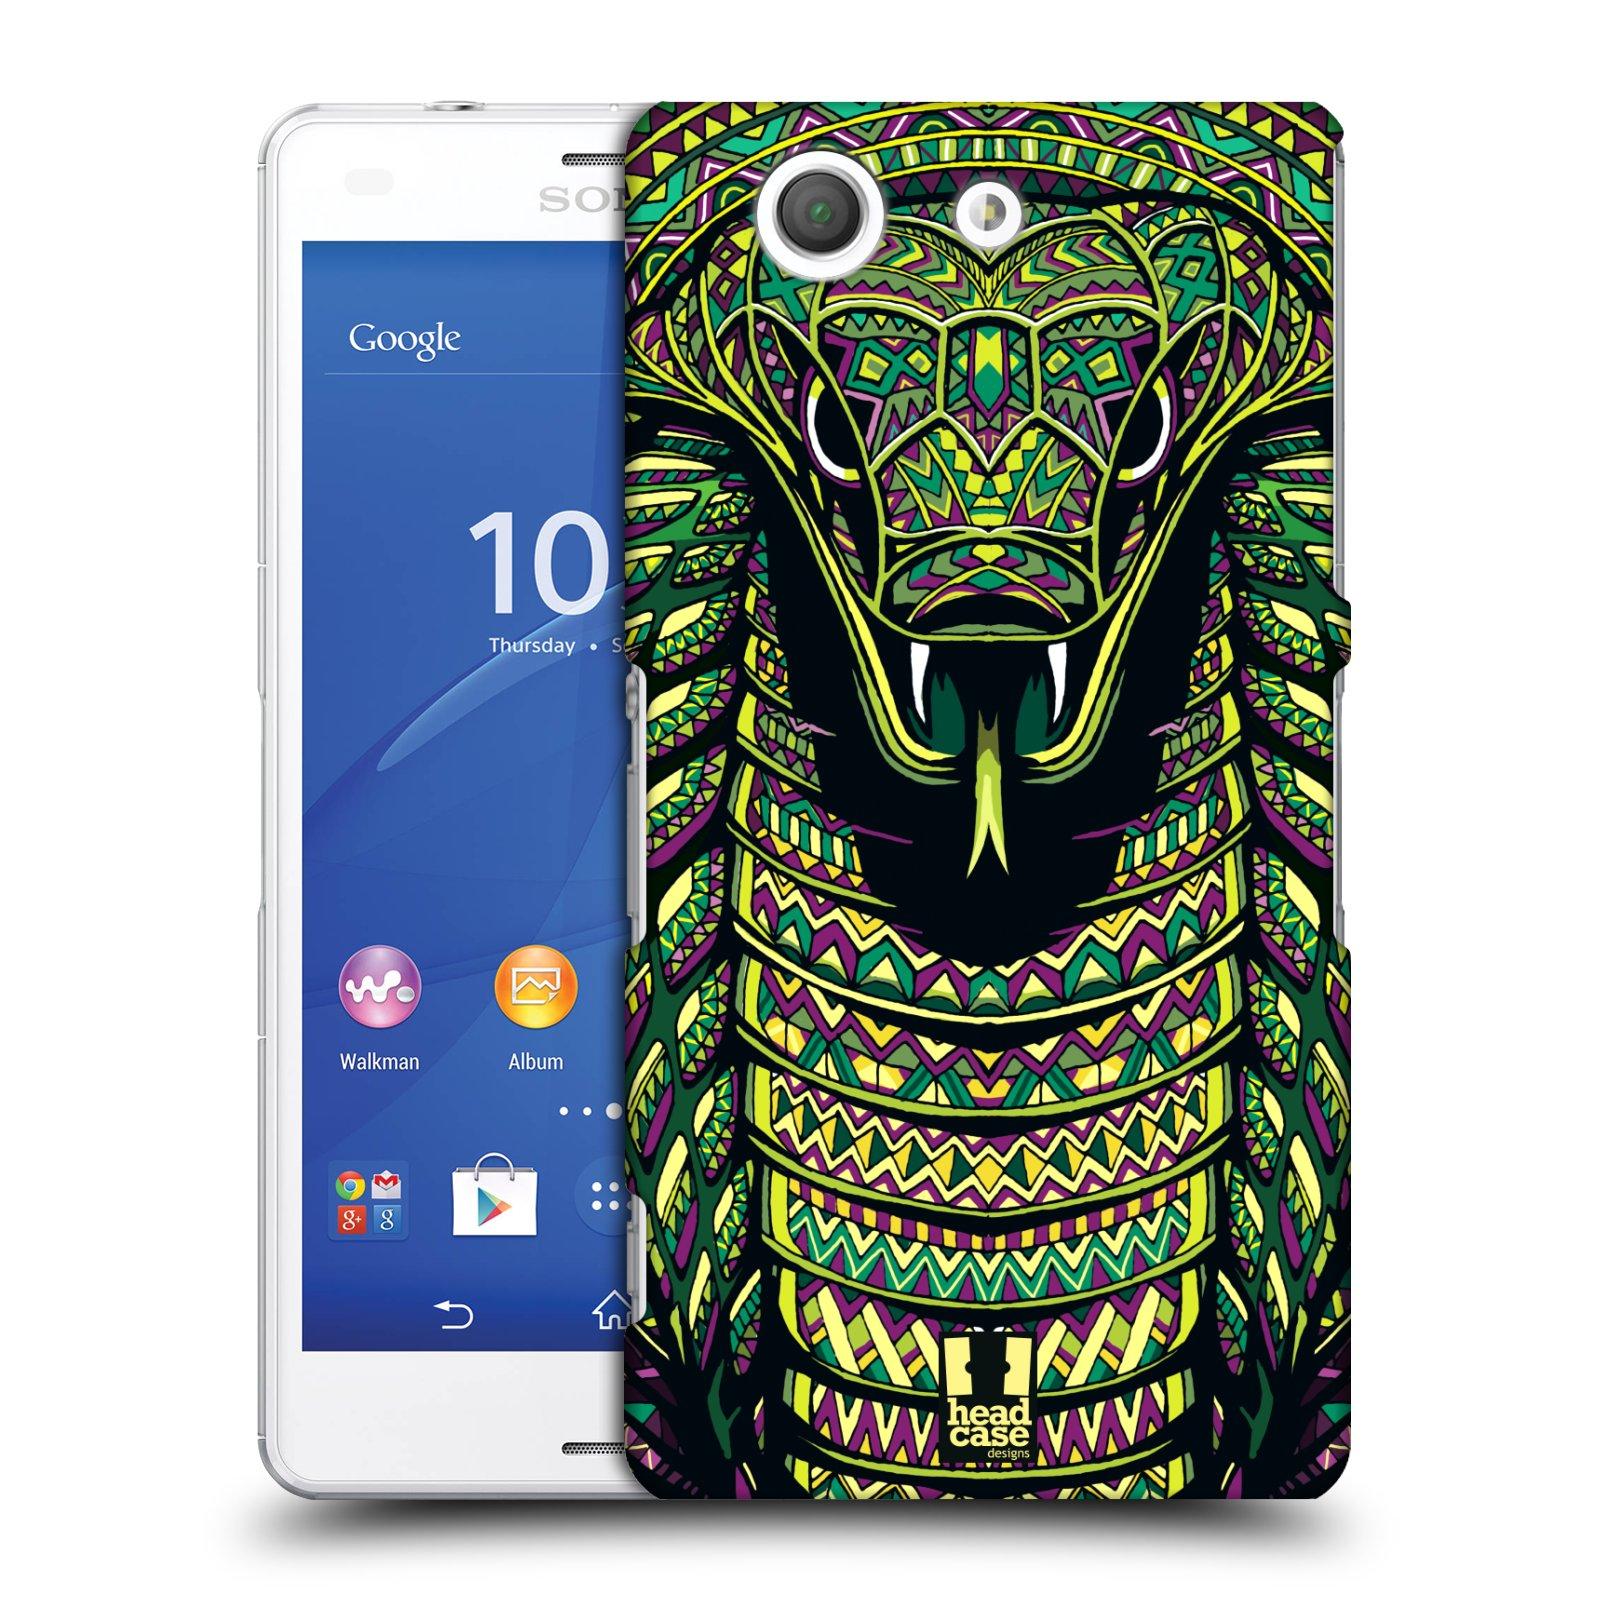 Plastové pouzdro na mobil Sony Xperia Z3 Compact D5803 HEAD CASE AZTEC HAD